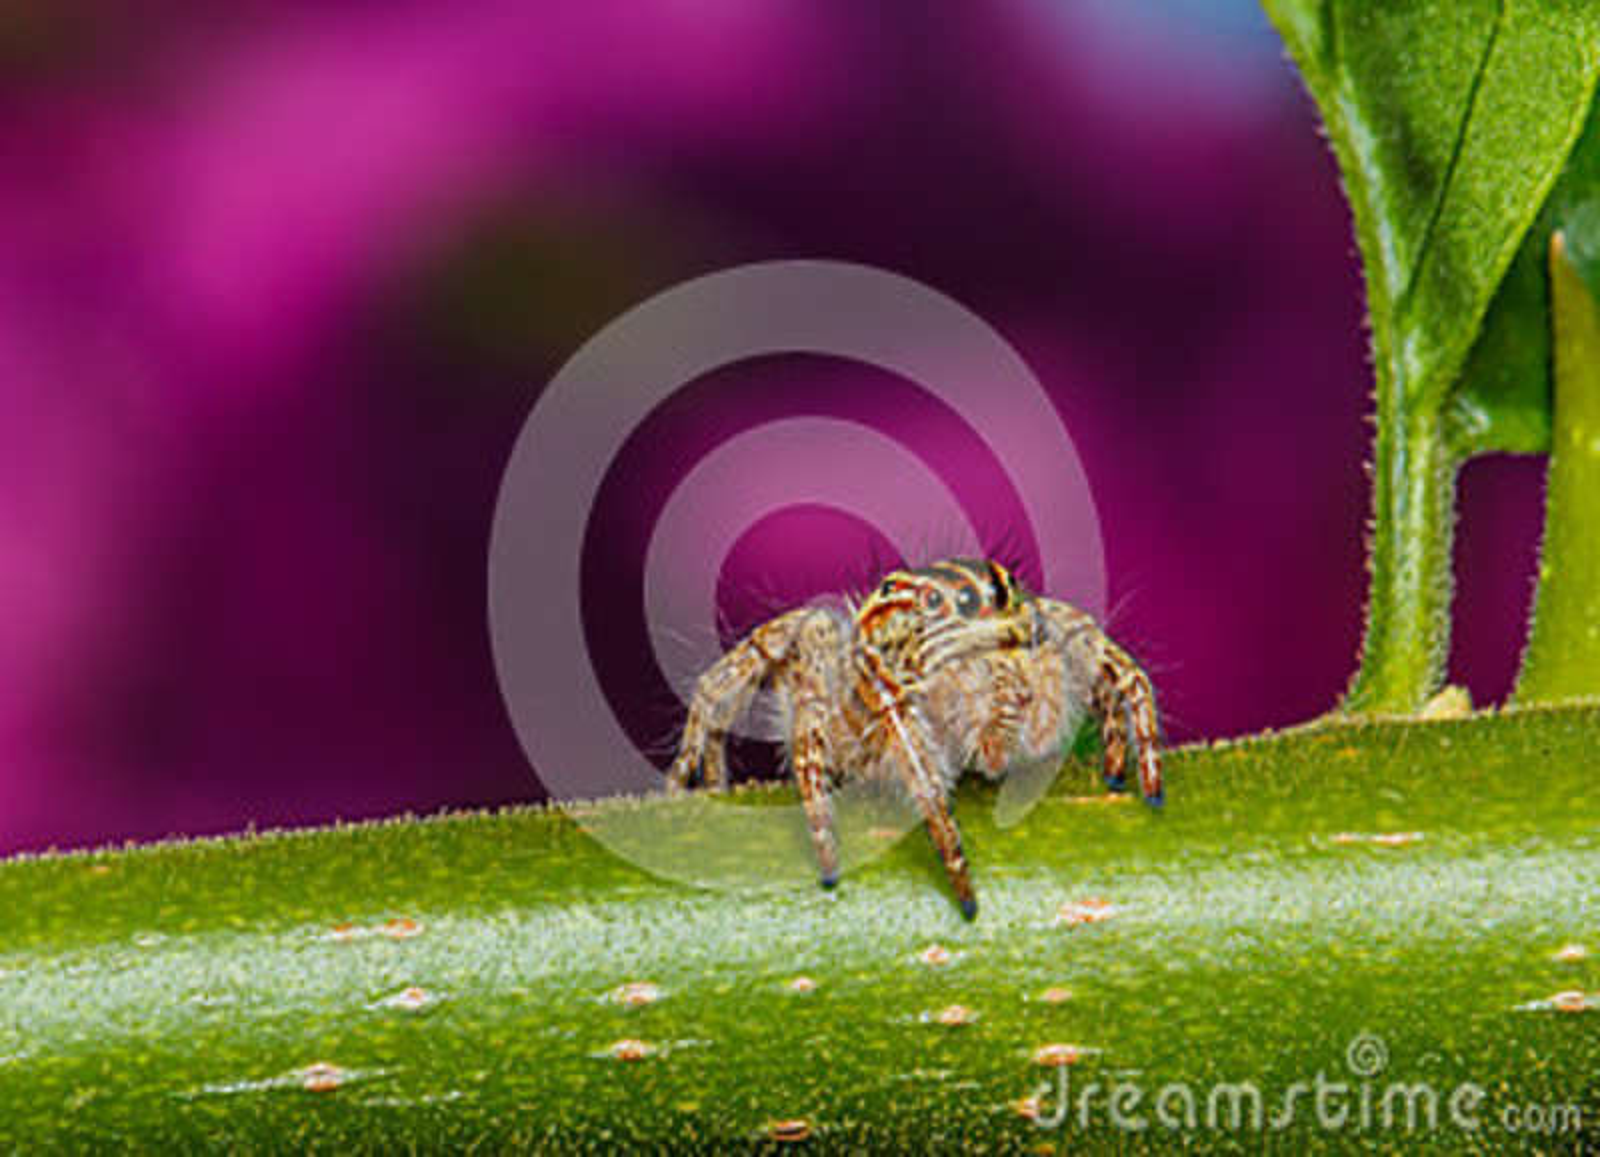 Araña de salto en la hoja verde